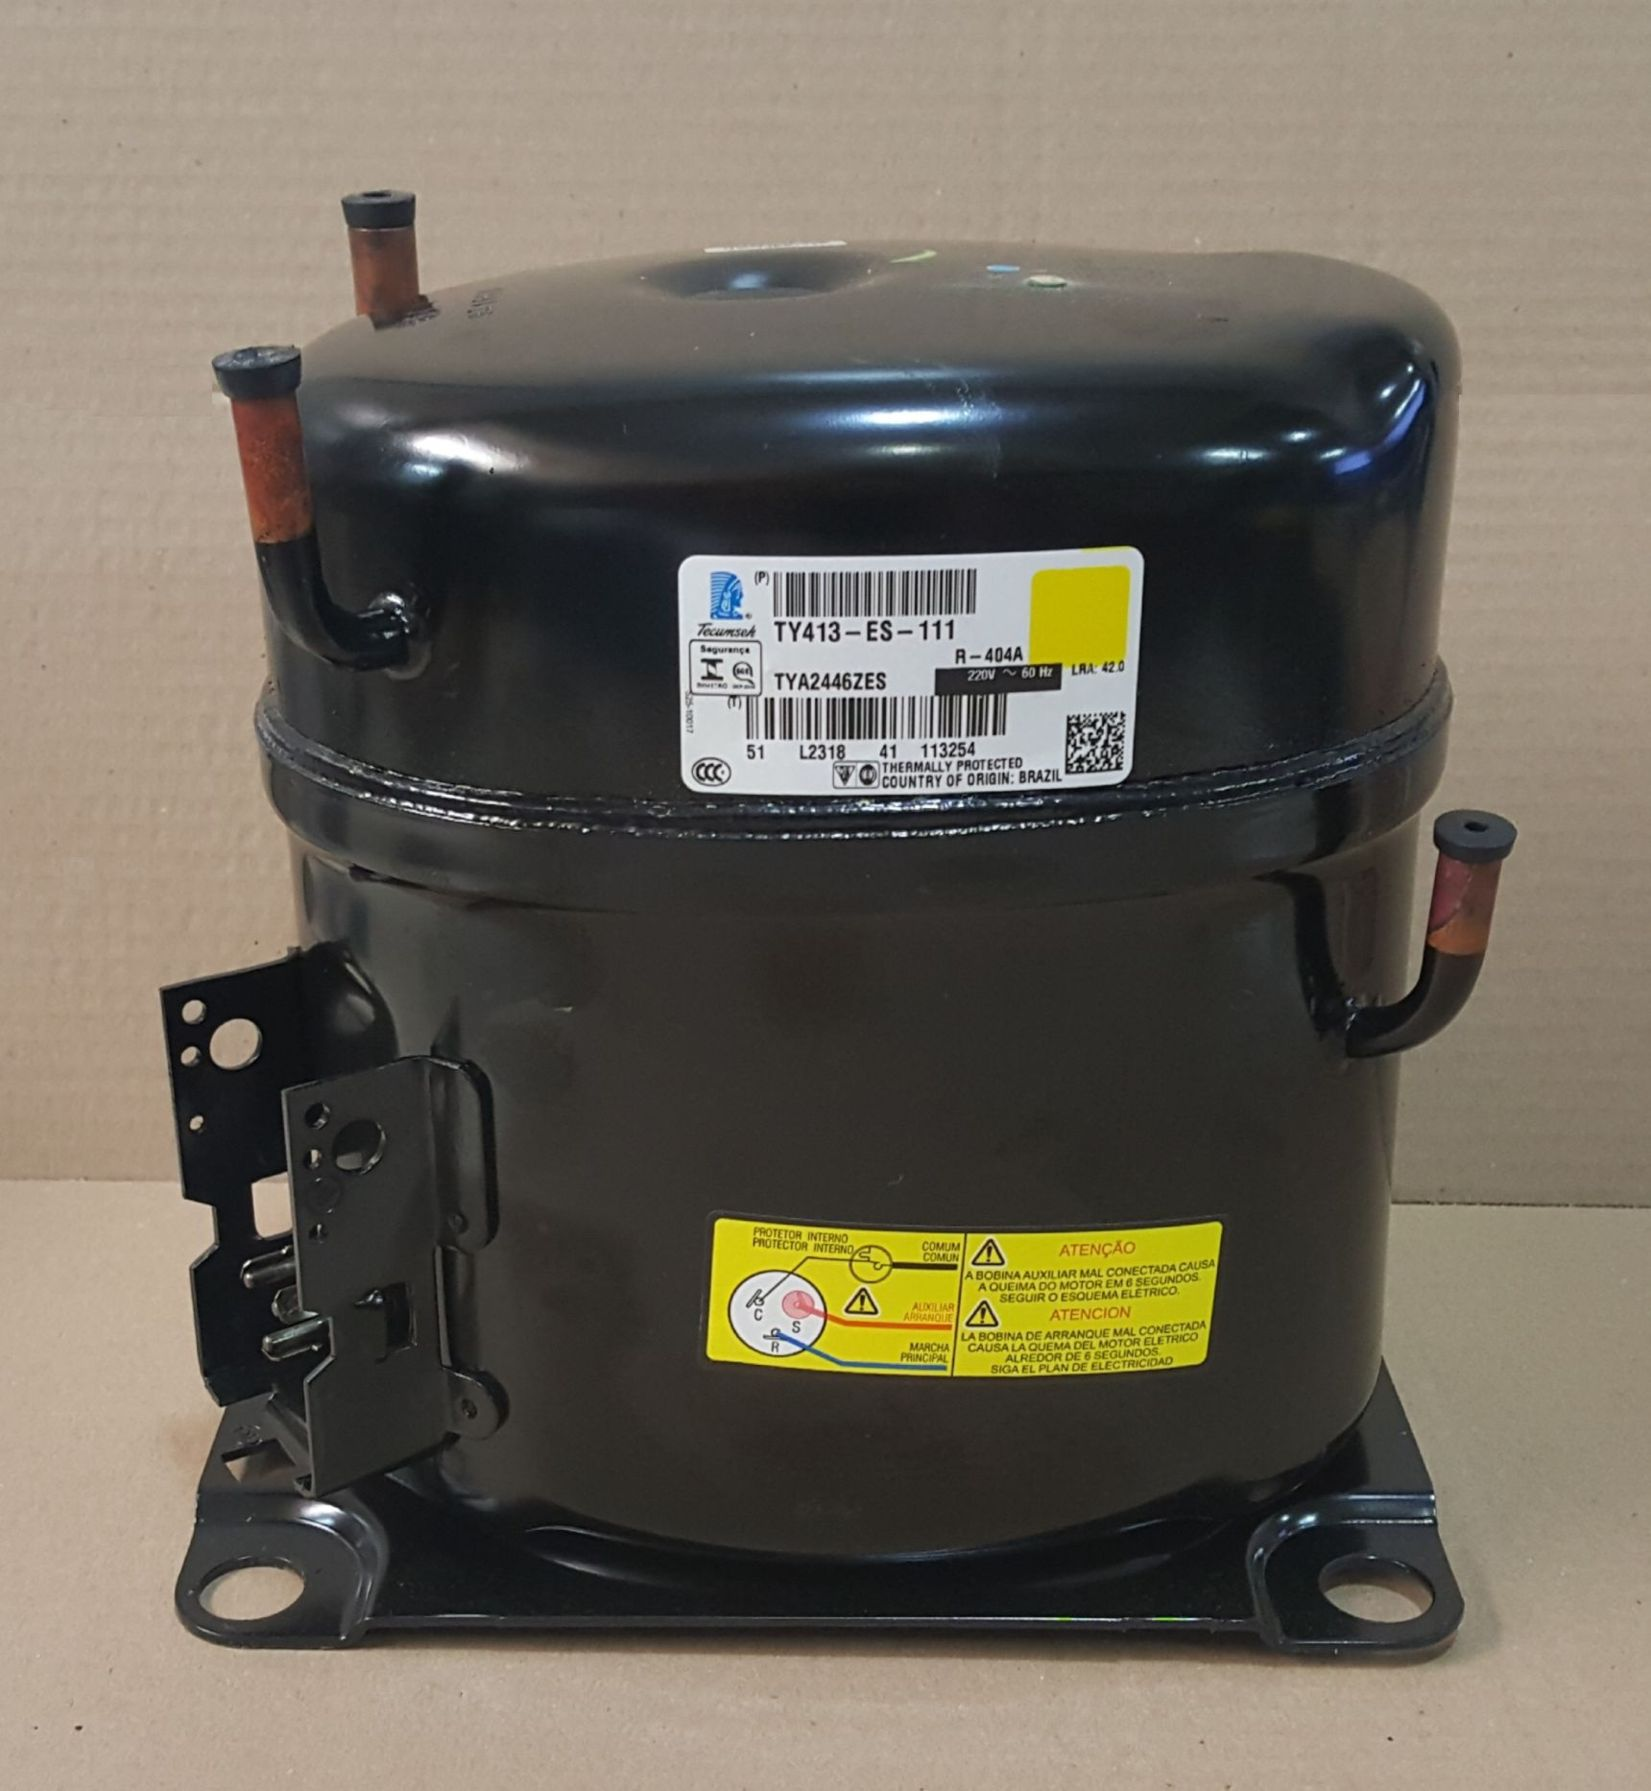 MOTOR COMPRESSOR TECUMSEH 1 1/2 HP - TYA2446ZES - R404 - 220v